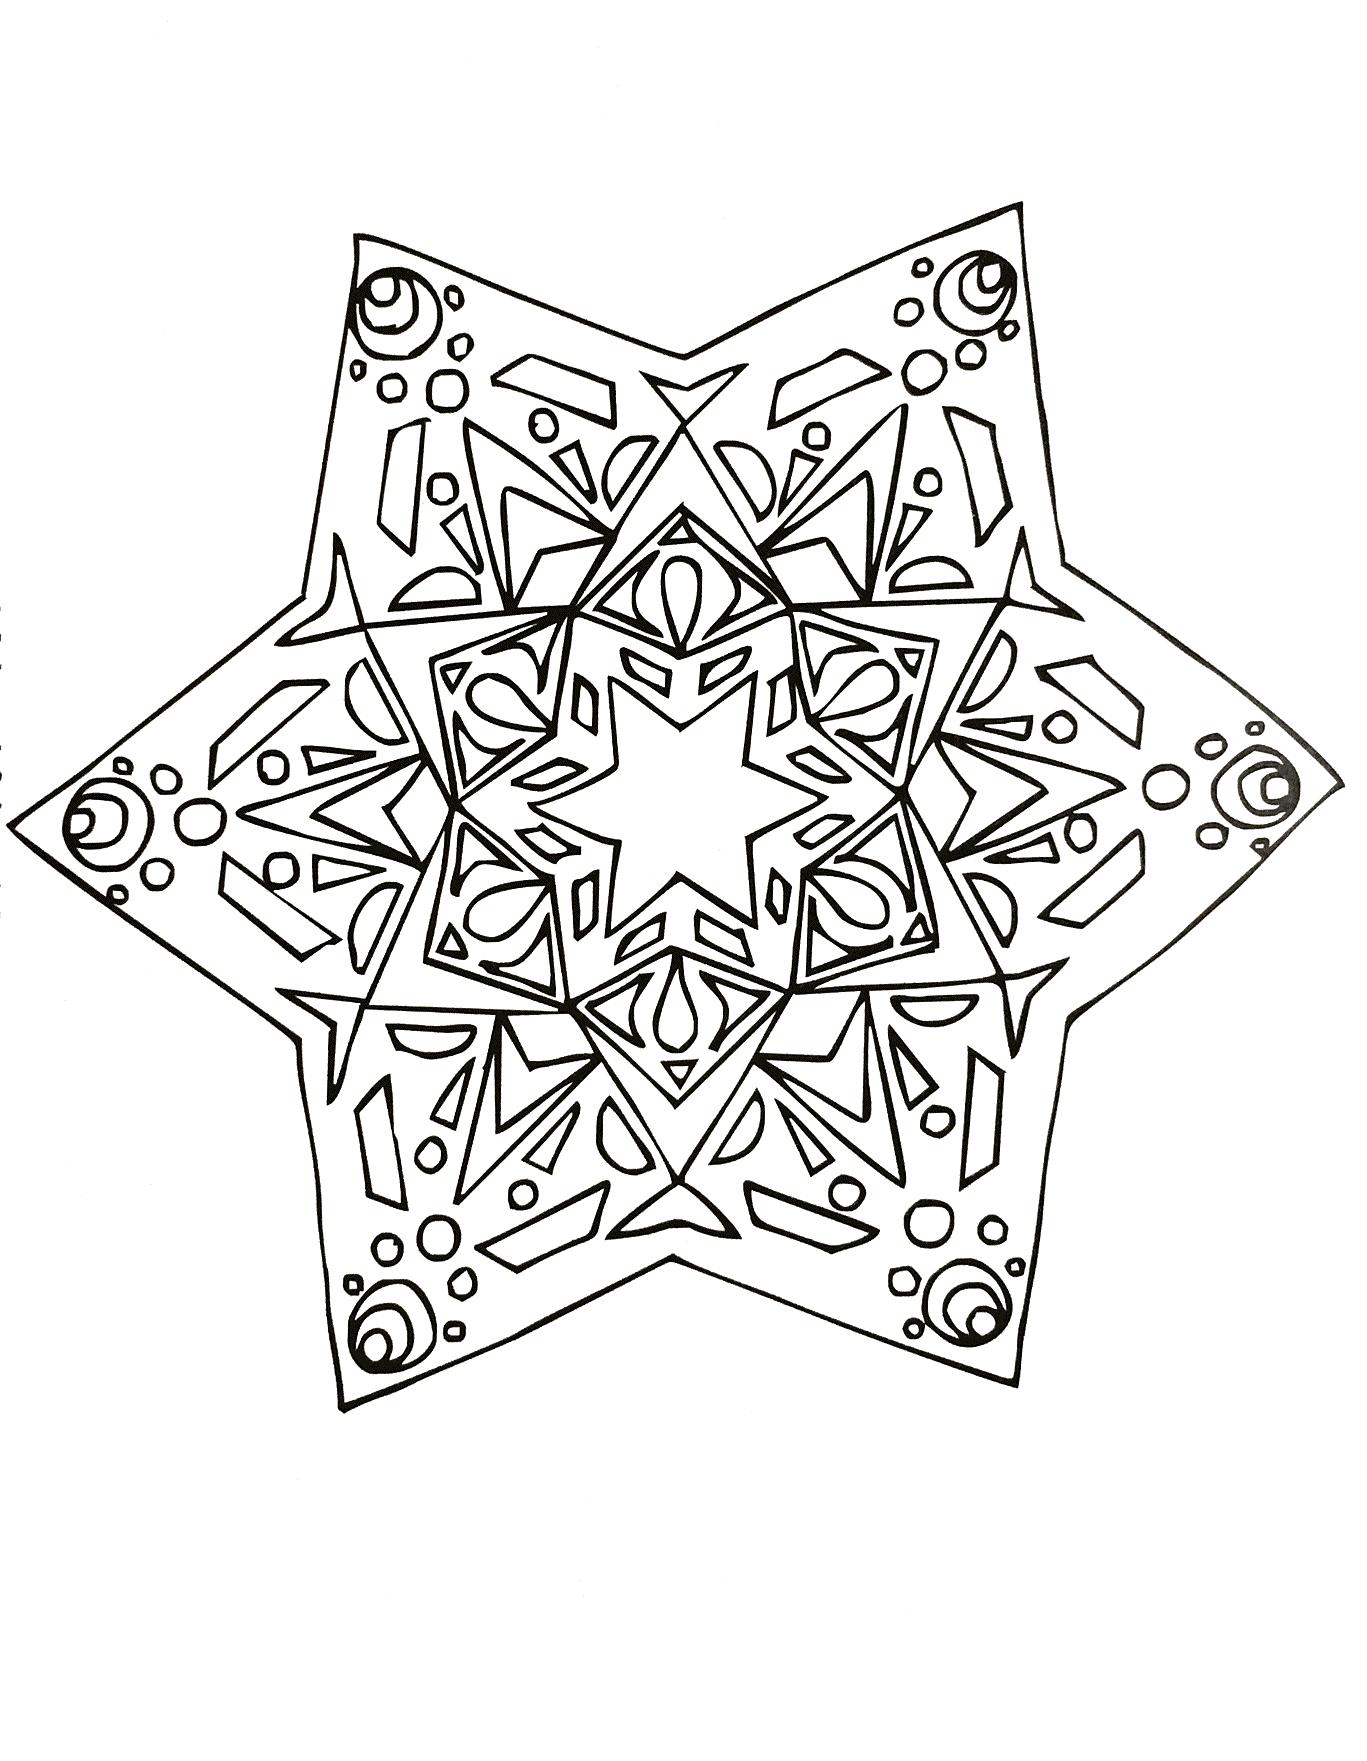 Coloriage De Mandala Etoile.Mandala Dessine A La Main En Forme D Etoile Mandalas Zen Anti